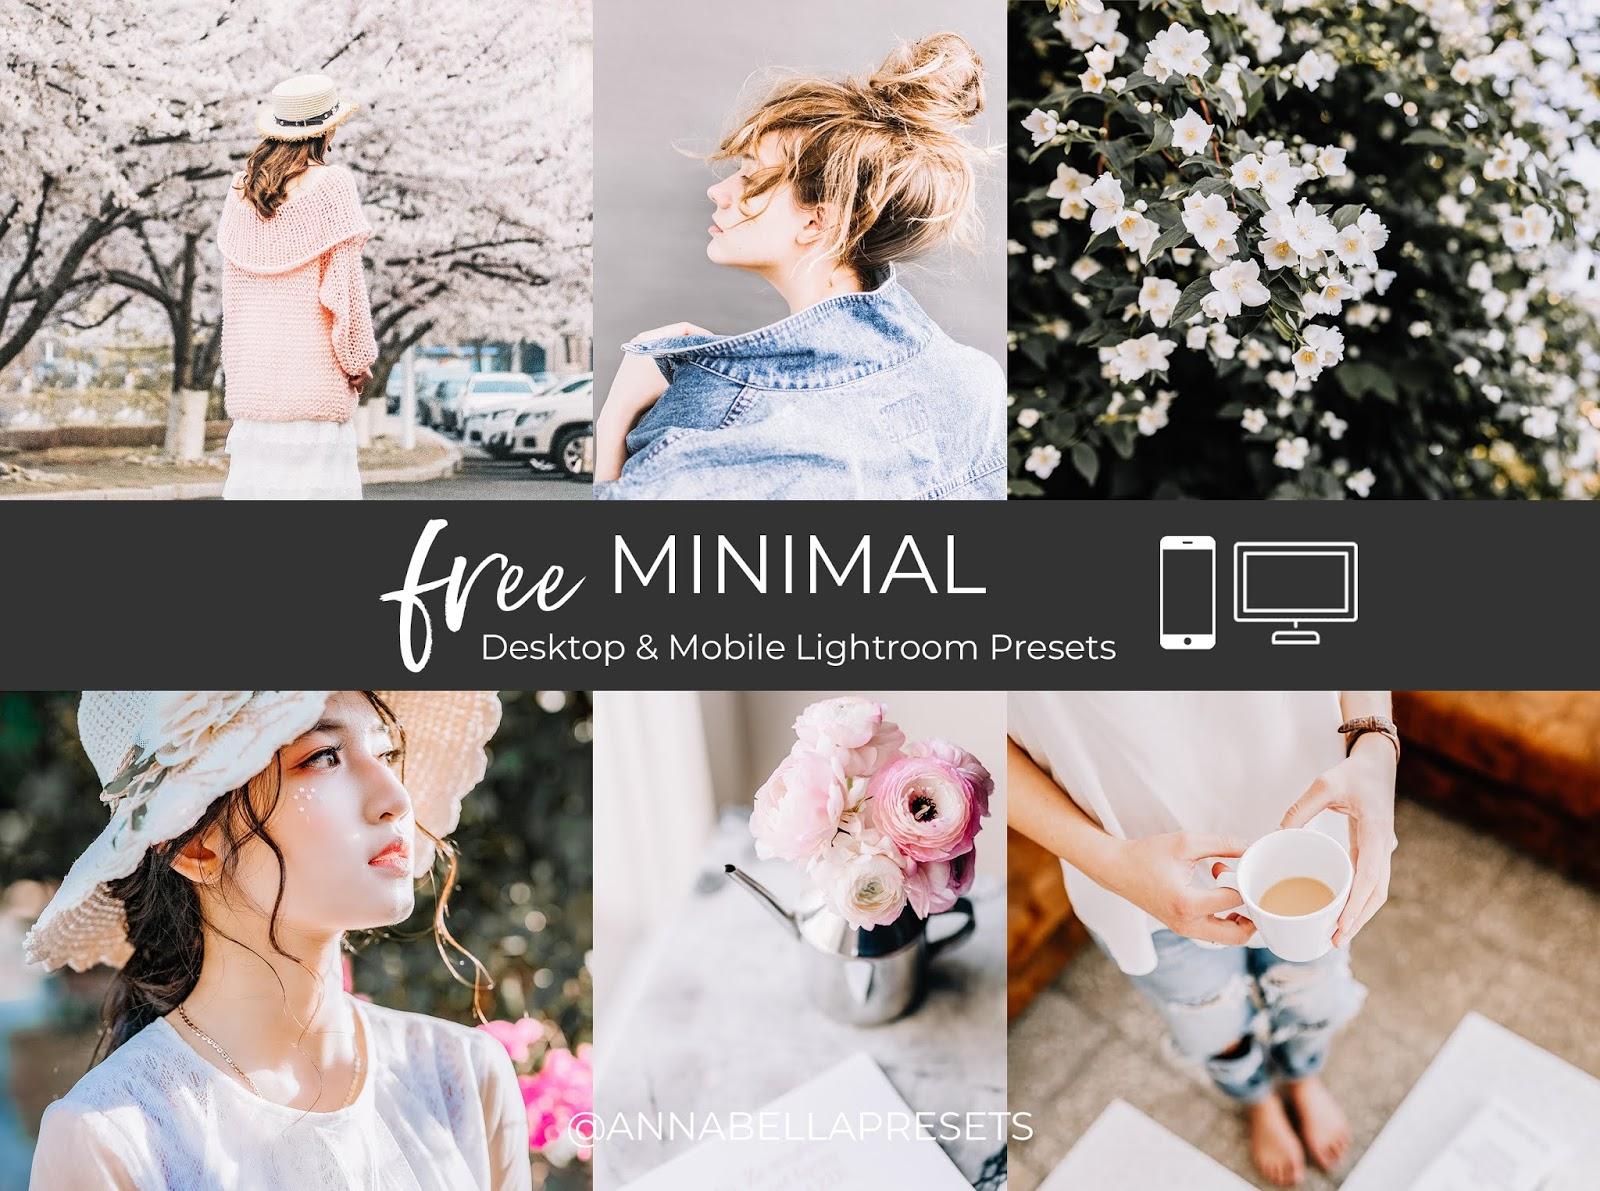 Free Minimal LR Mobile & Desktop Preset for Bloggers and Photographers